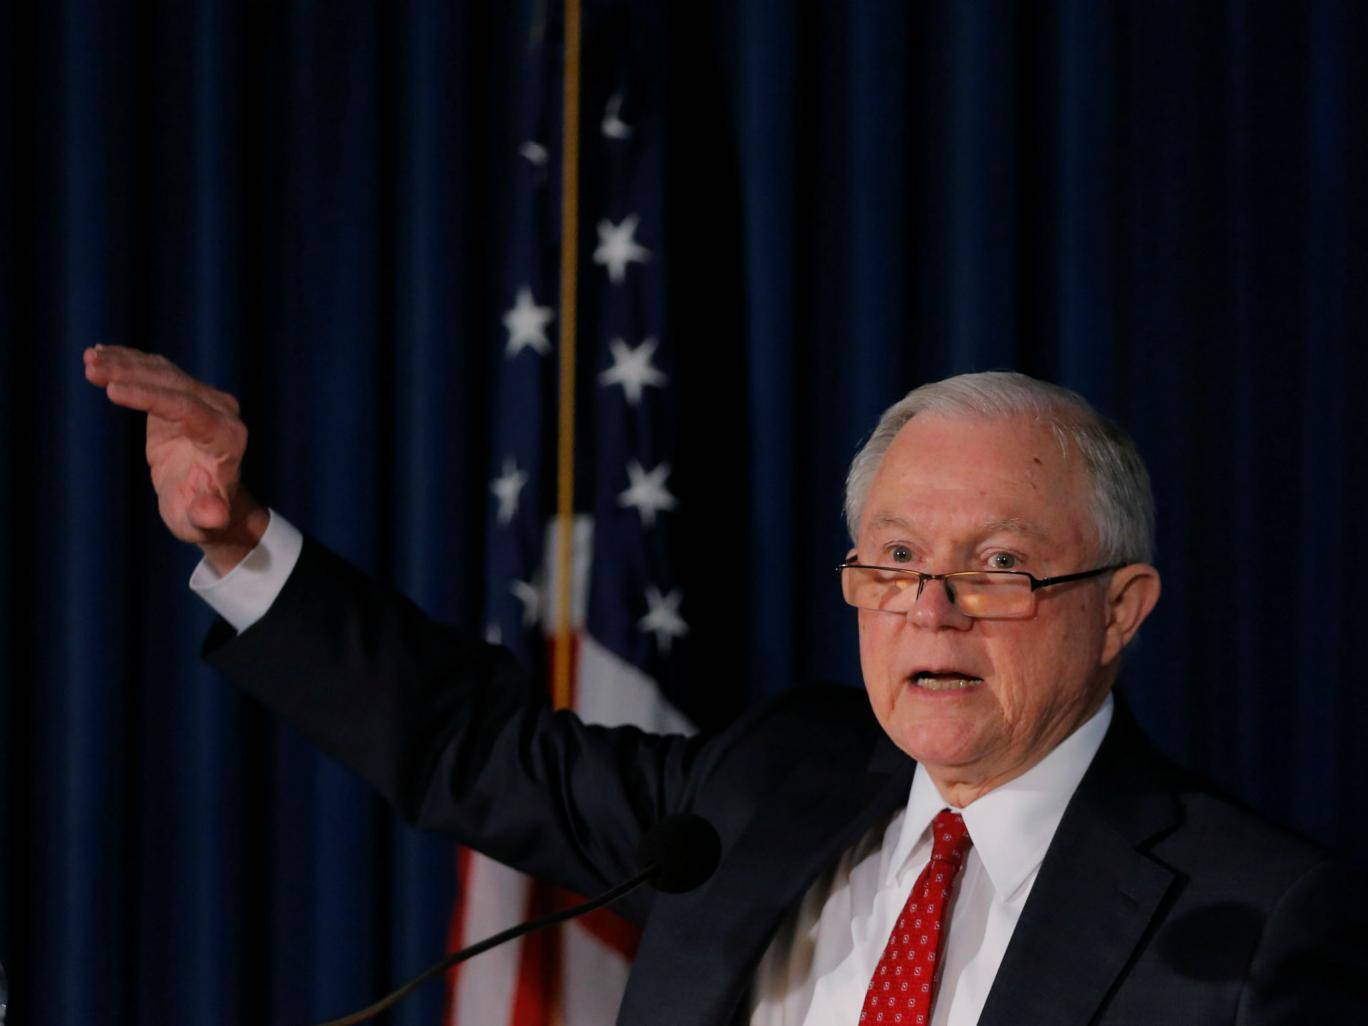 US Attorney General may open new Clinton investigation https://t.co/aFizWXlW5Y https://t.co/QBIQtiPtUk